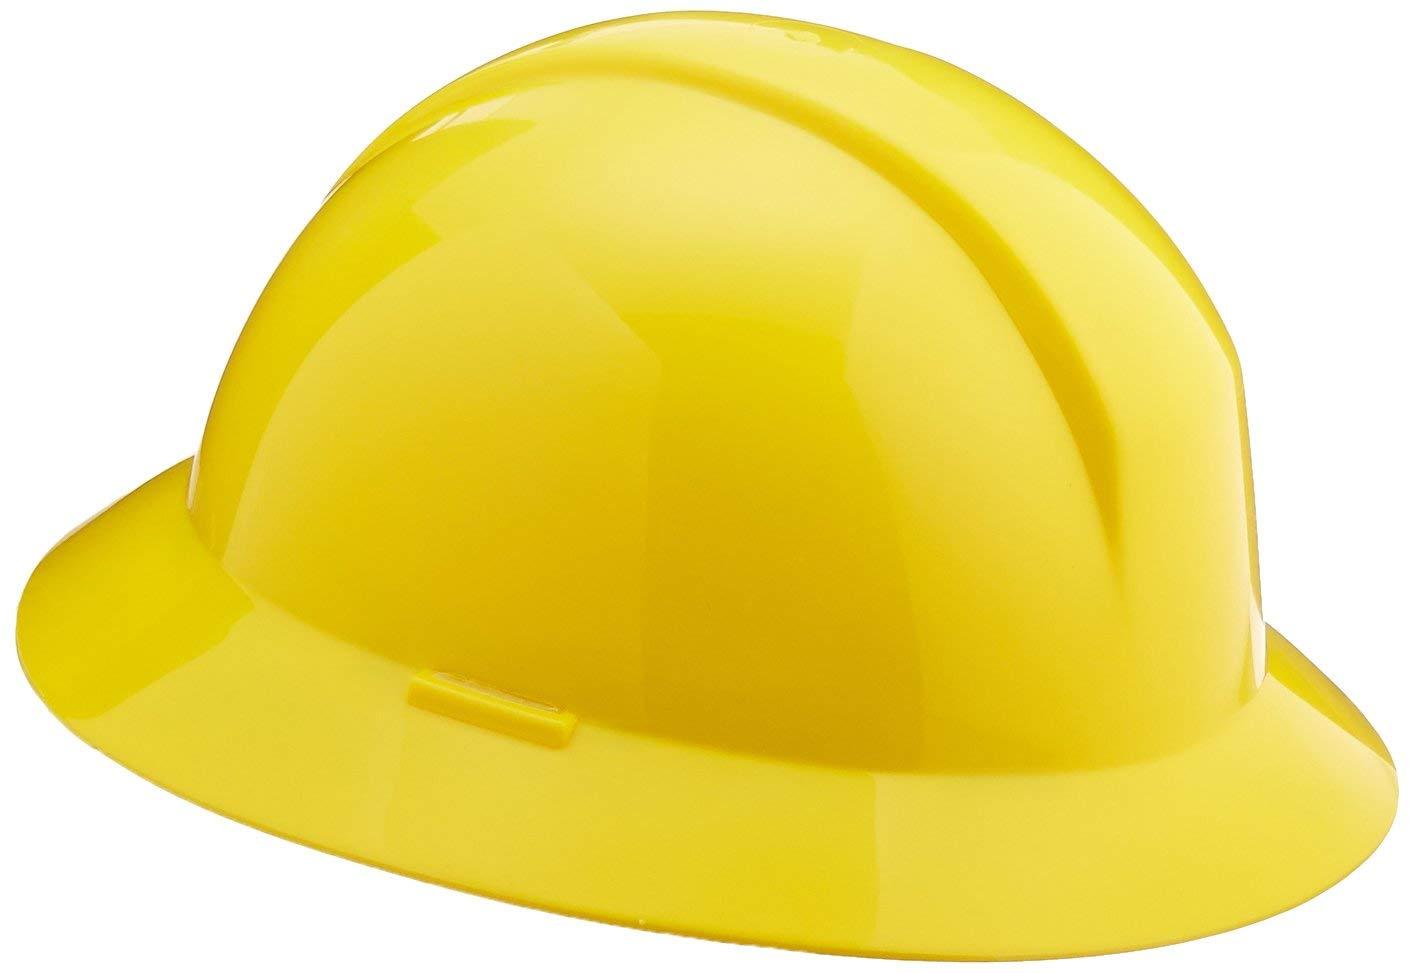 20-Pk Honeywell Peak Hard Hat 4 Point Nylon Suspension by APD incorporated (Image #1)